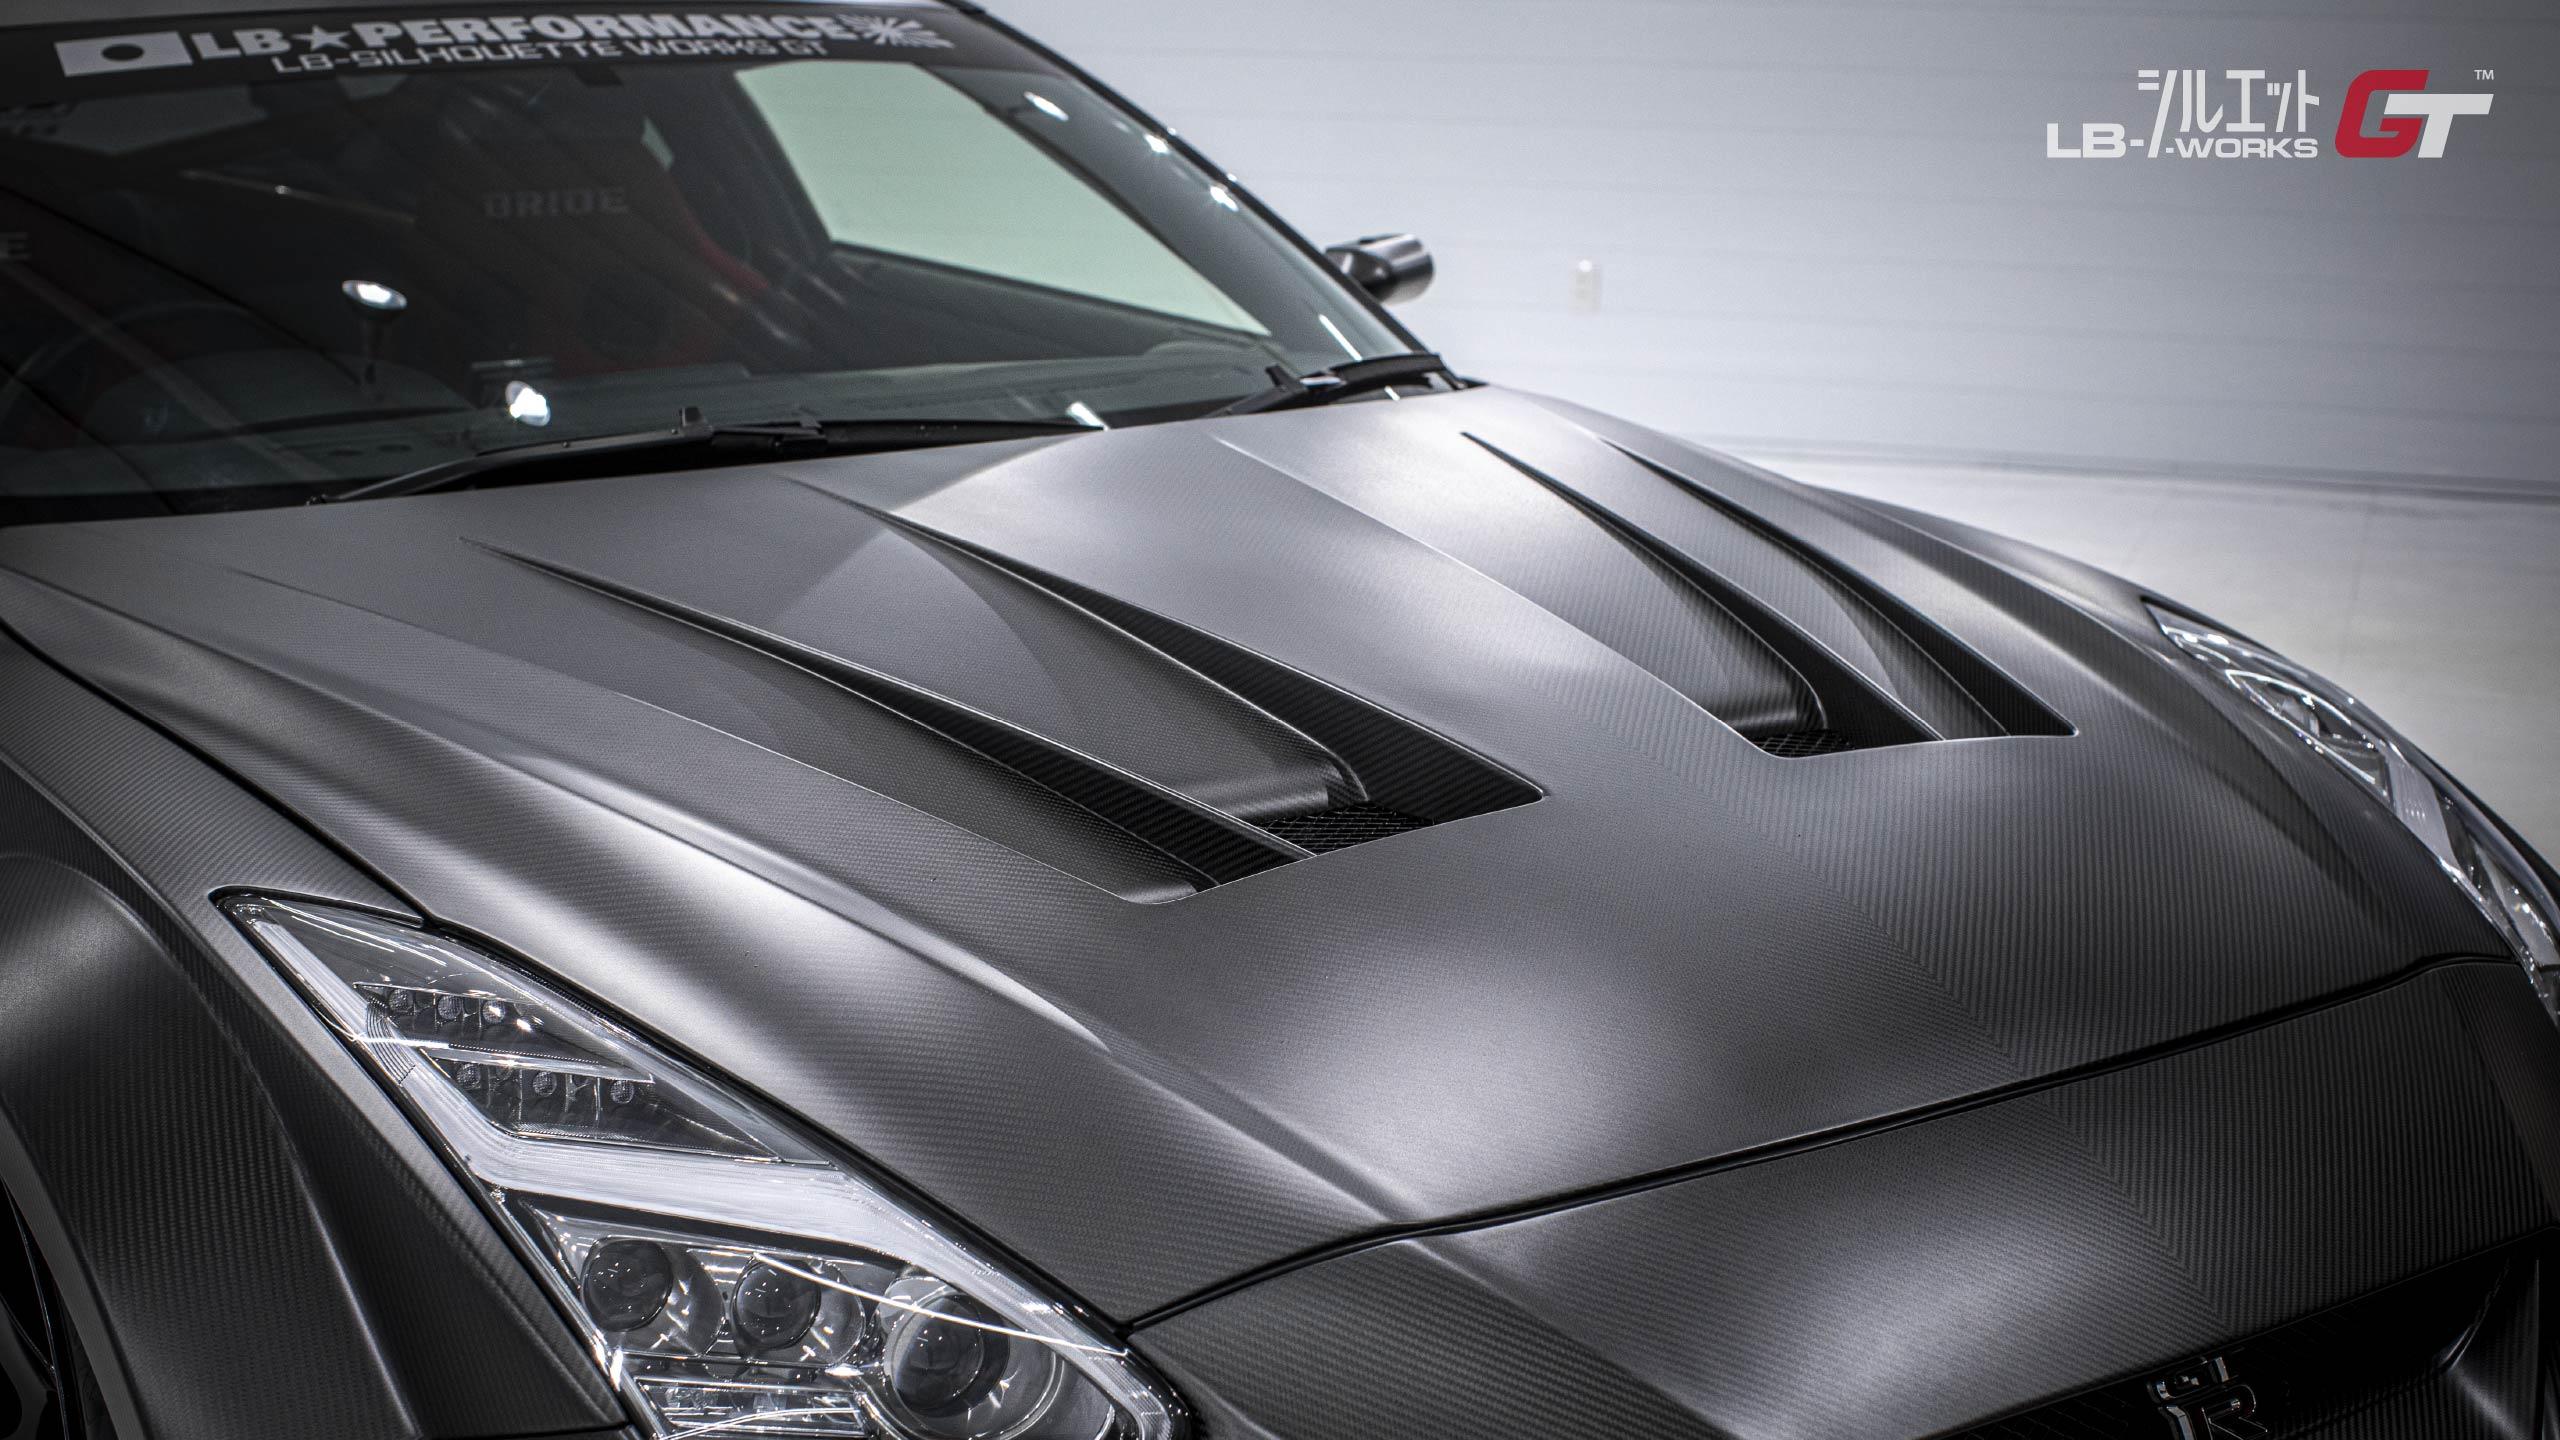 Liberty-Walk-Nissan-GT-R-Super-Silhouette-16